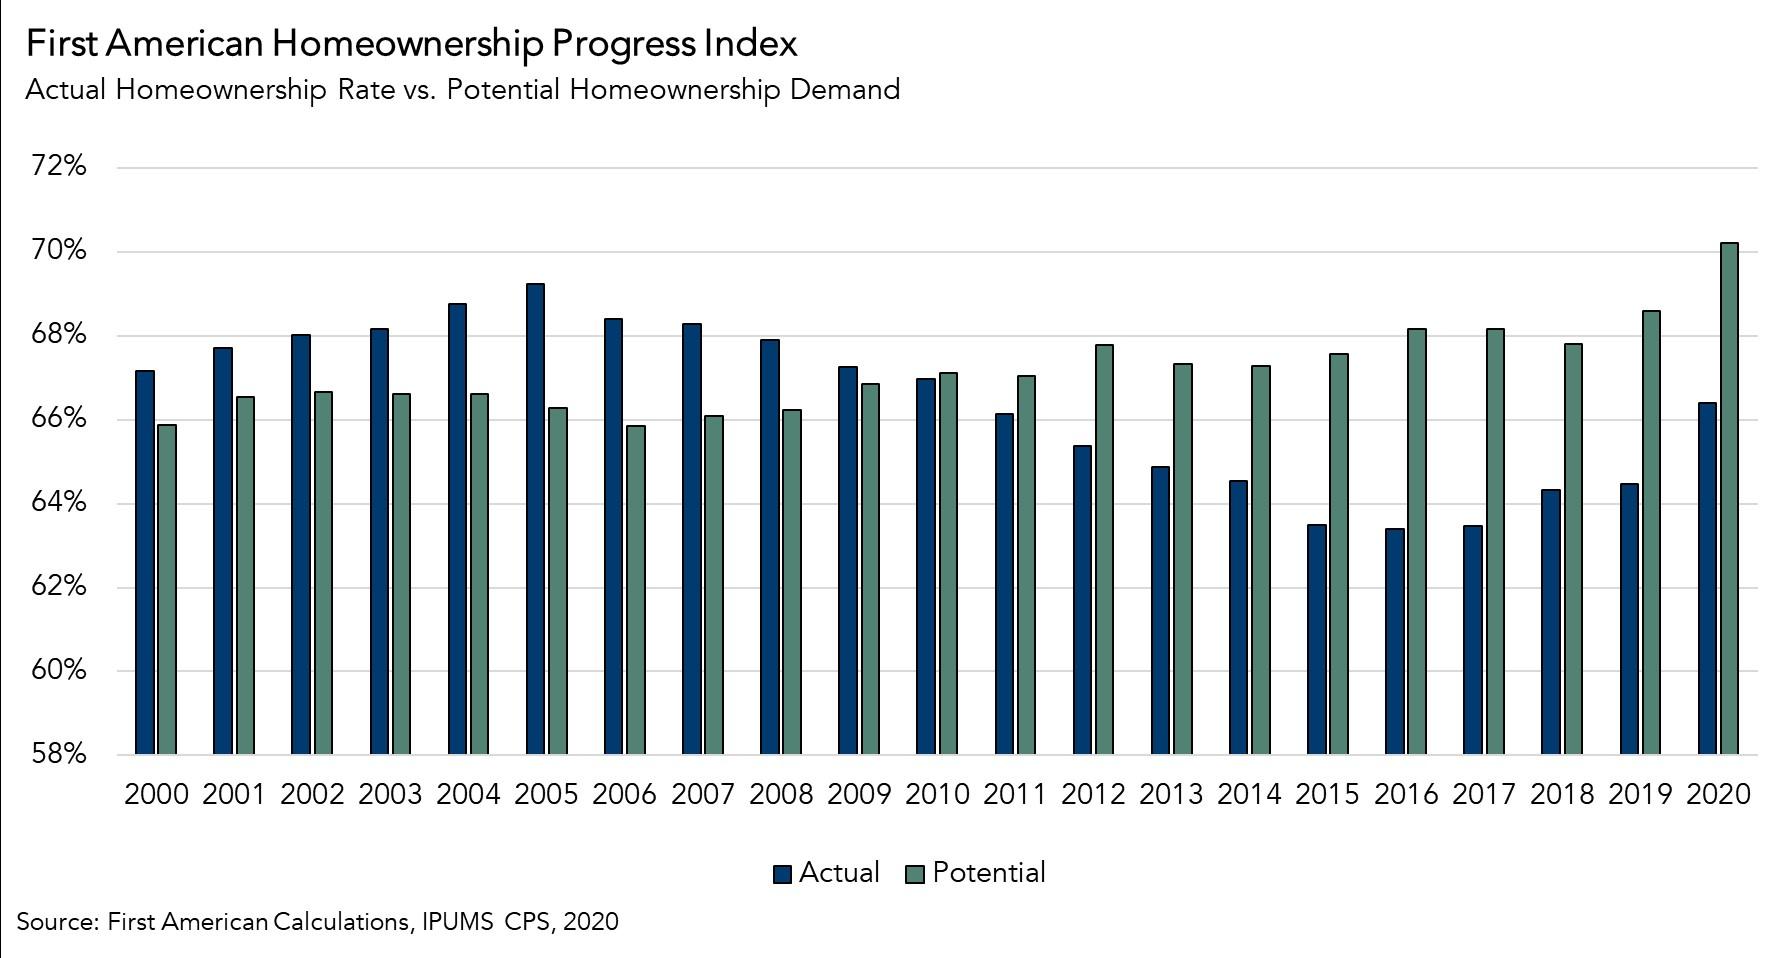 Actual Hoemownership Rate vs Potential Homeownership Demand Chart 2020